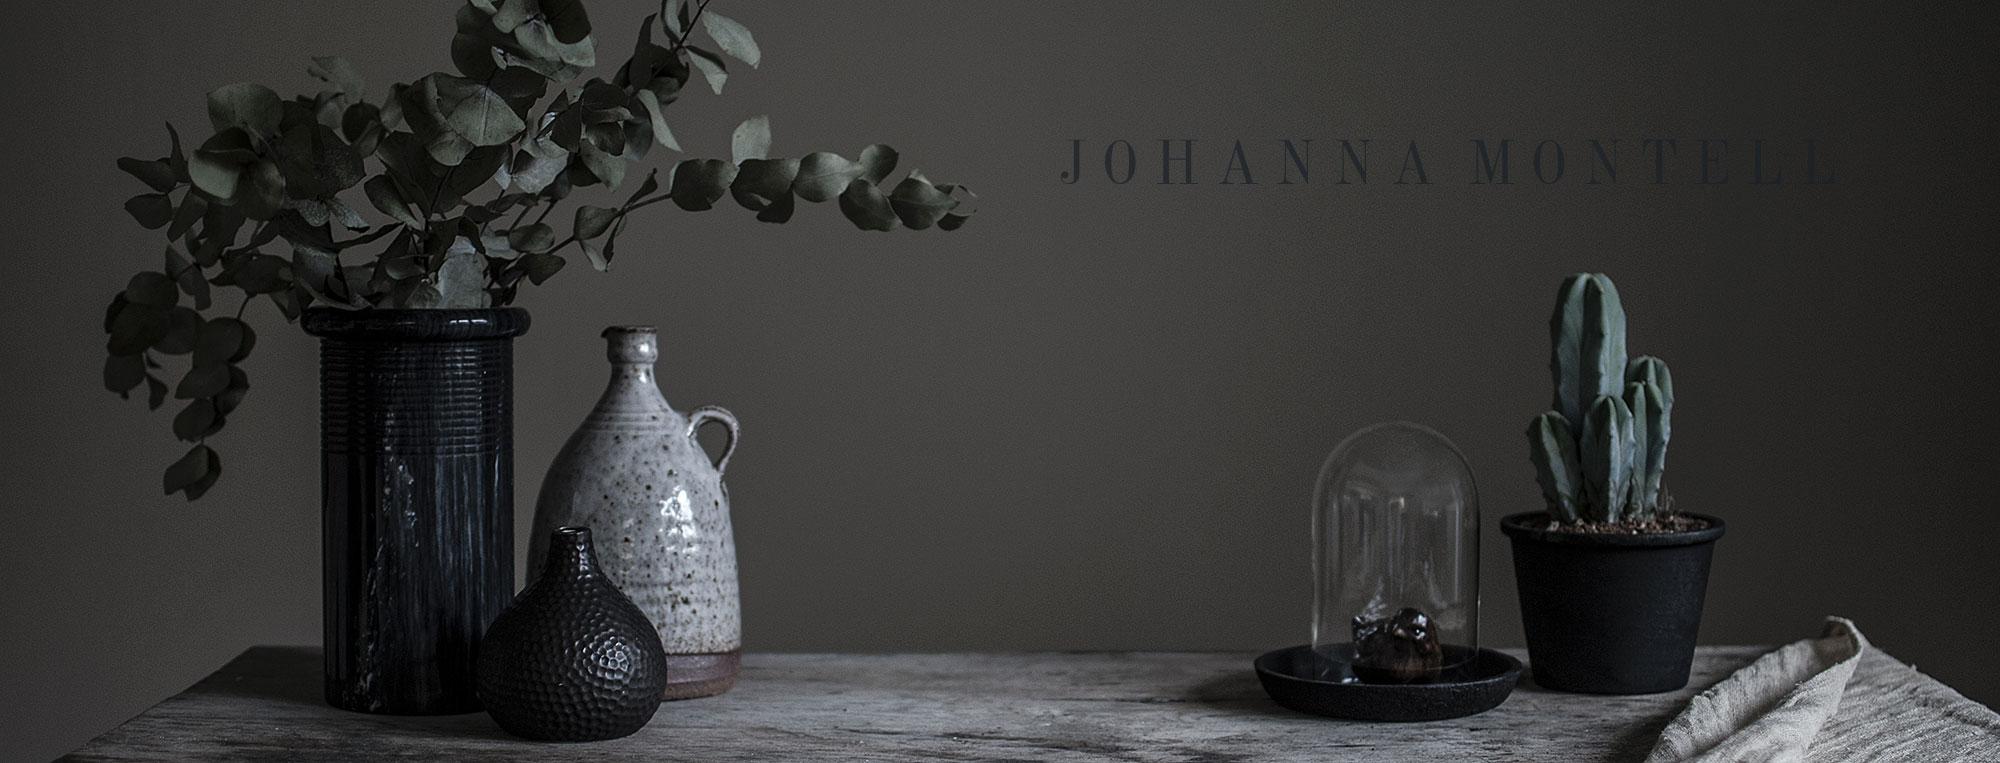 Johanna Montell - Second hand, Inredning & Foto